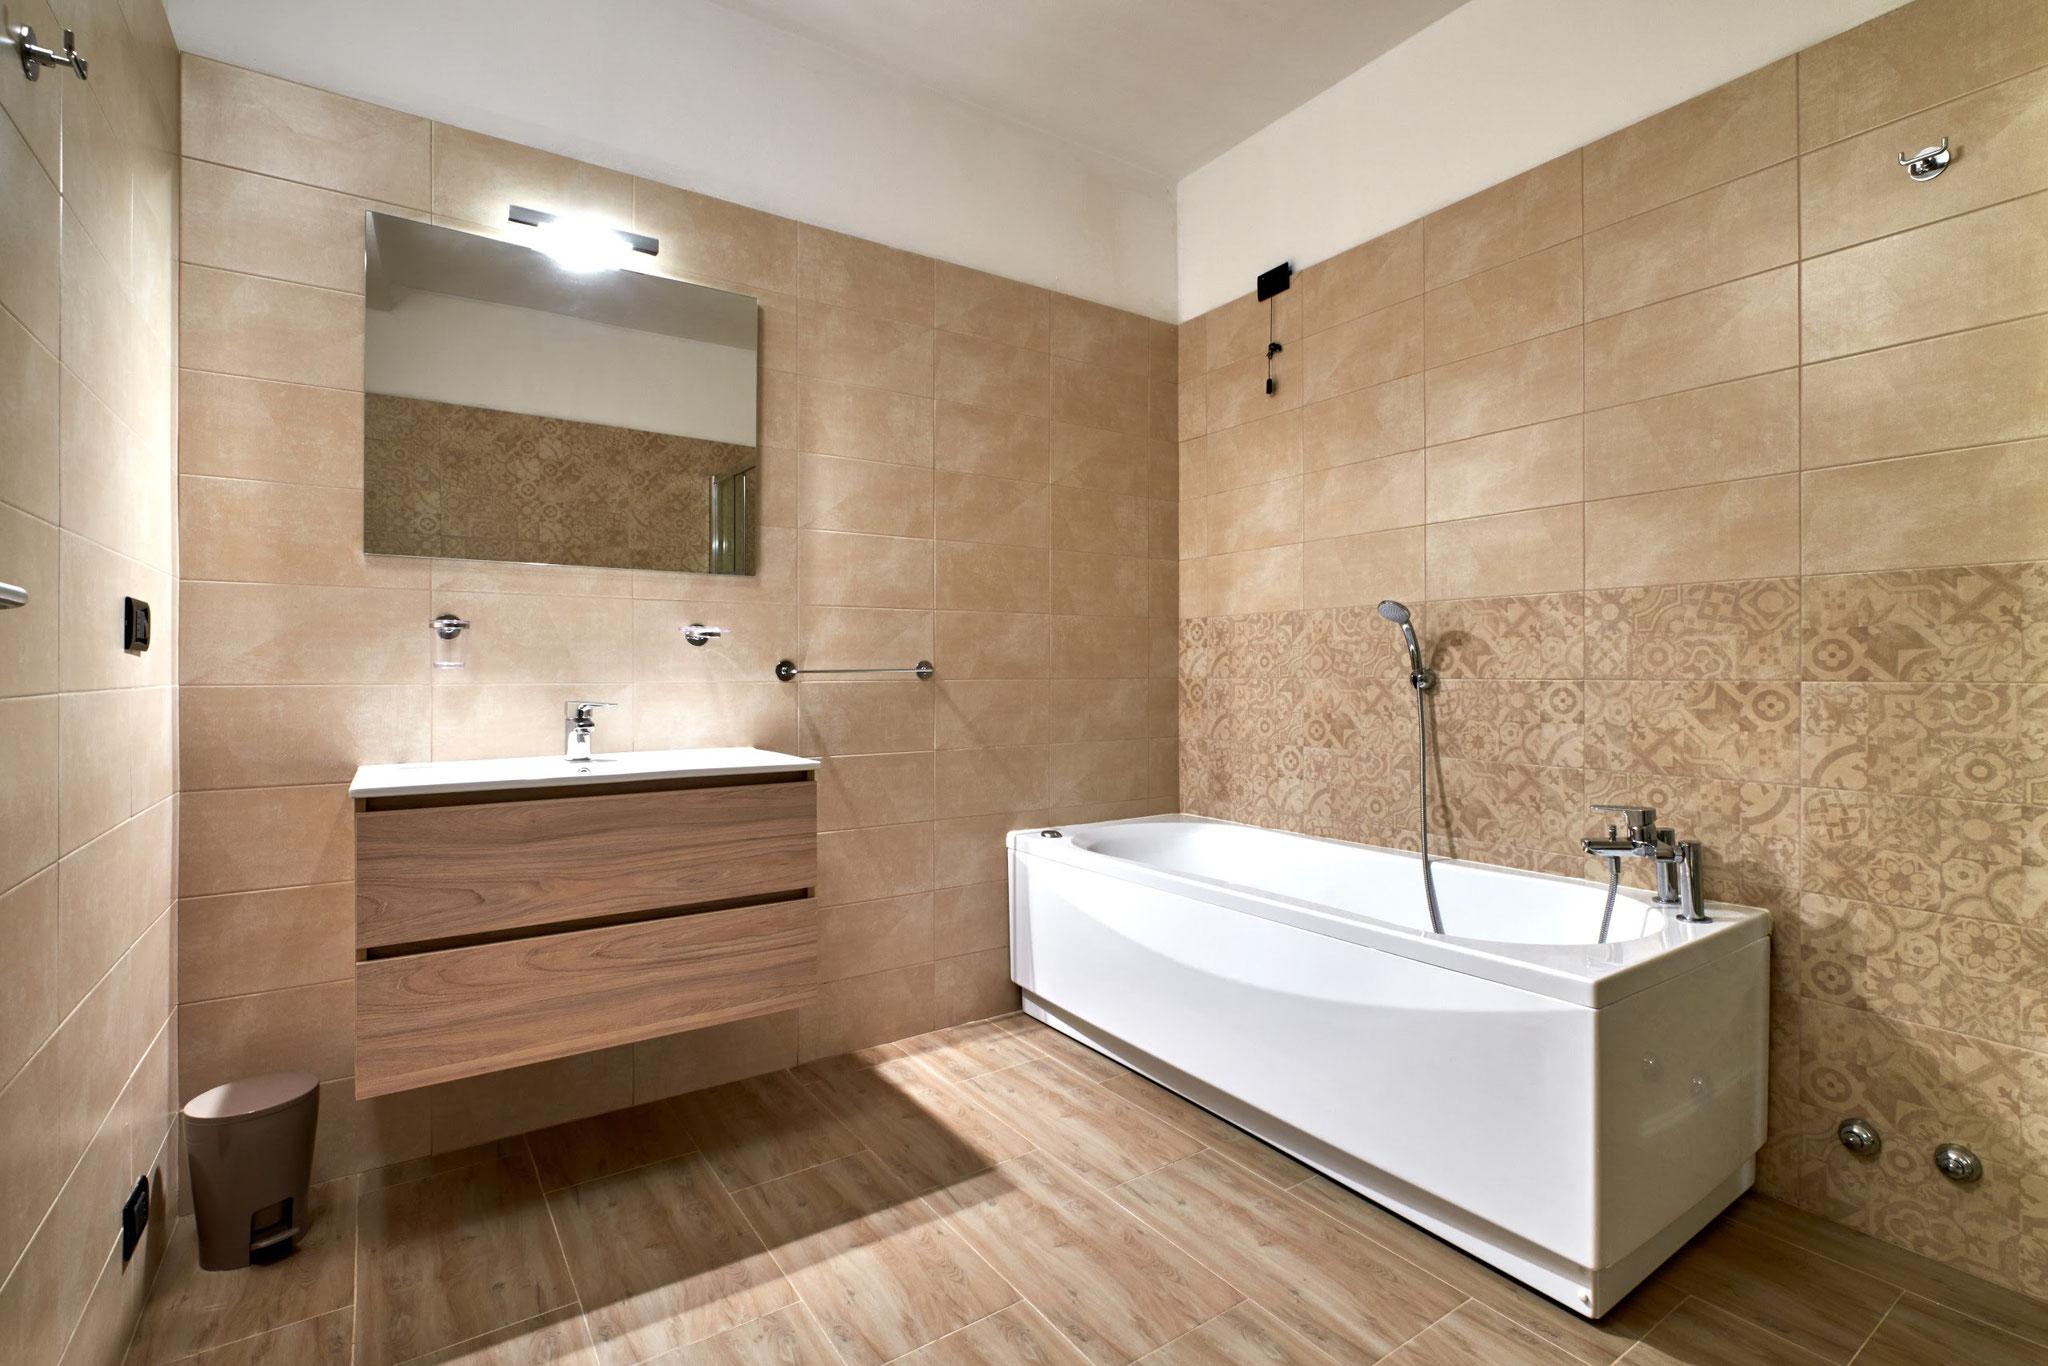 Casa San Giorgio Holiday House - Bedroom Holiday House AIR BNB Bed Breakfast Jacuzzi